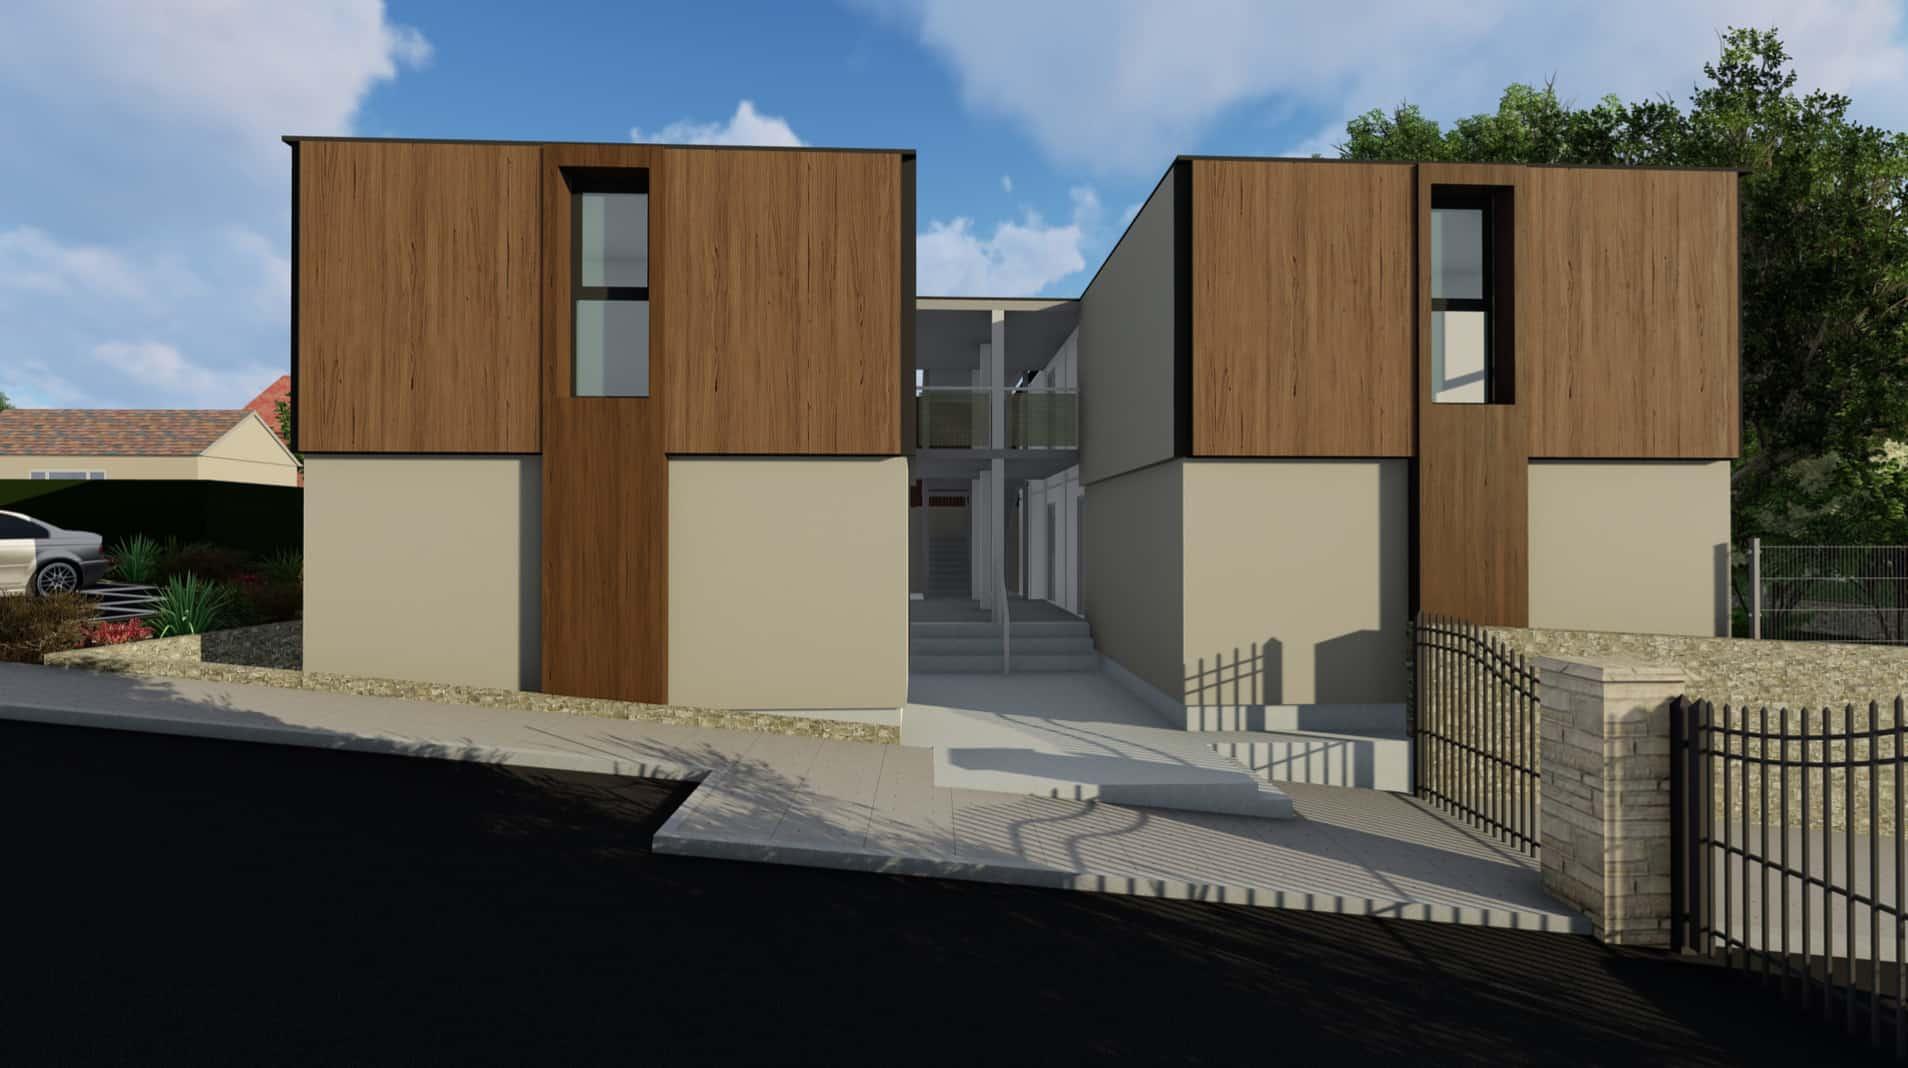 Concept design of modular housing